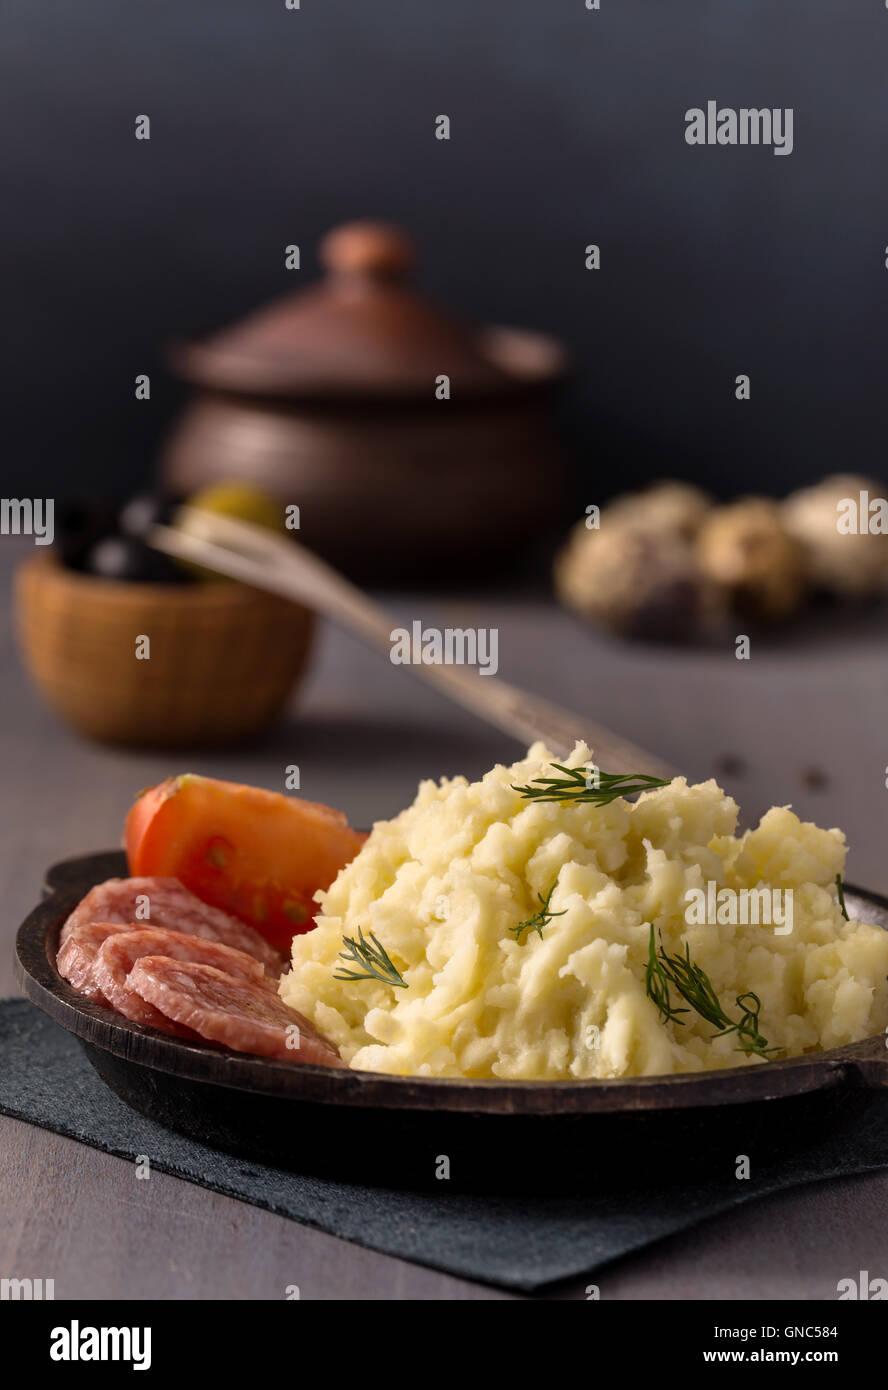 Mashed potatoes on plate - Stock Image